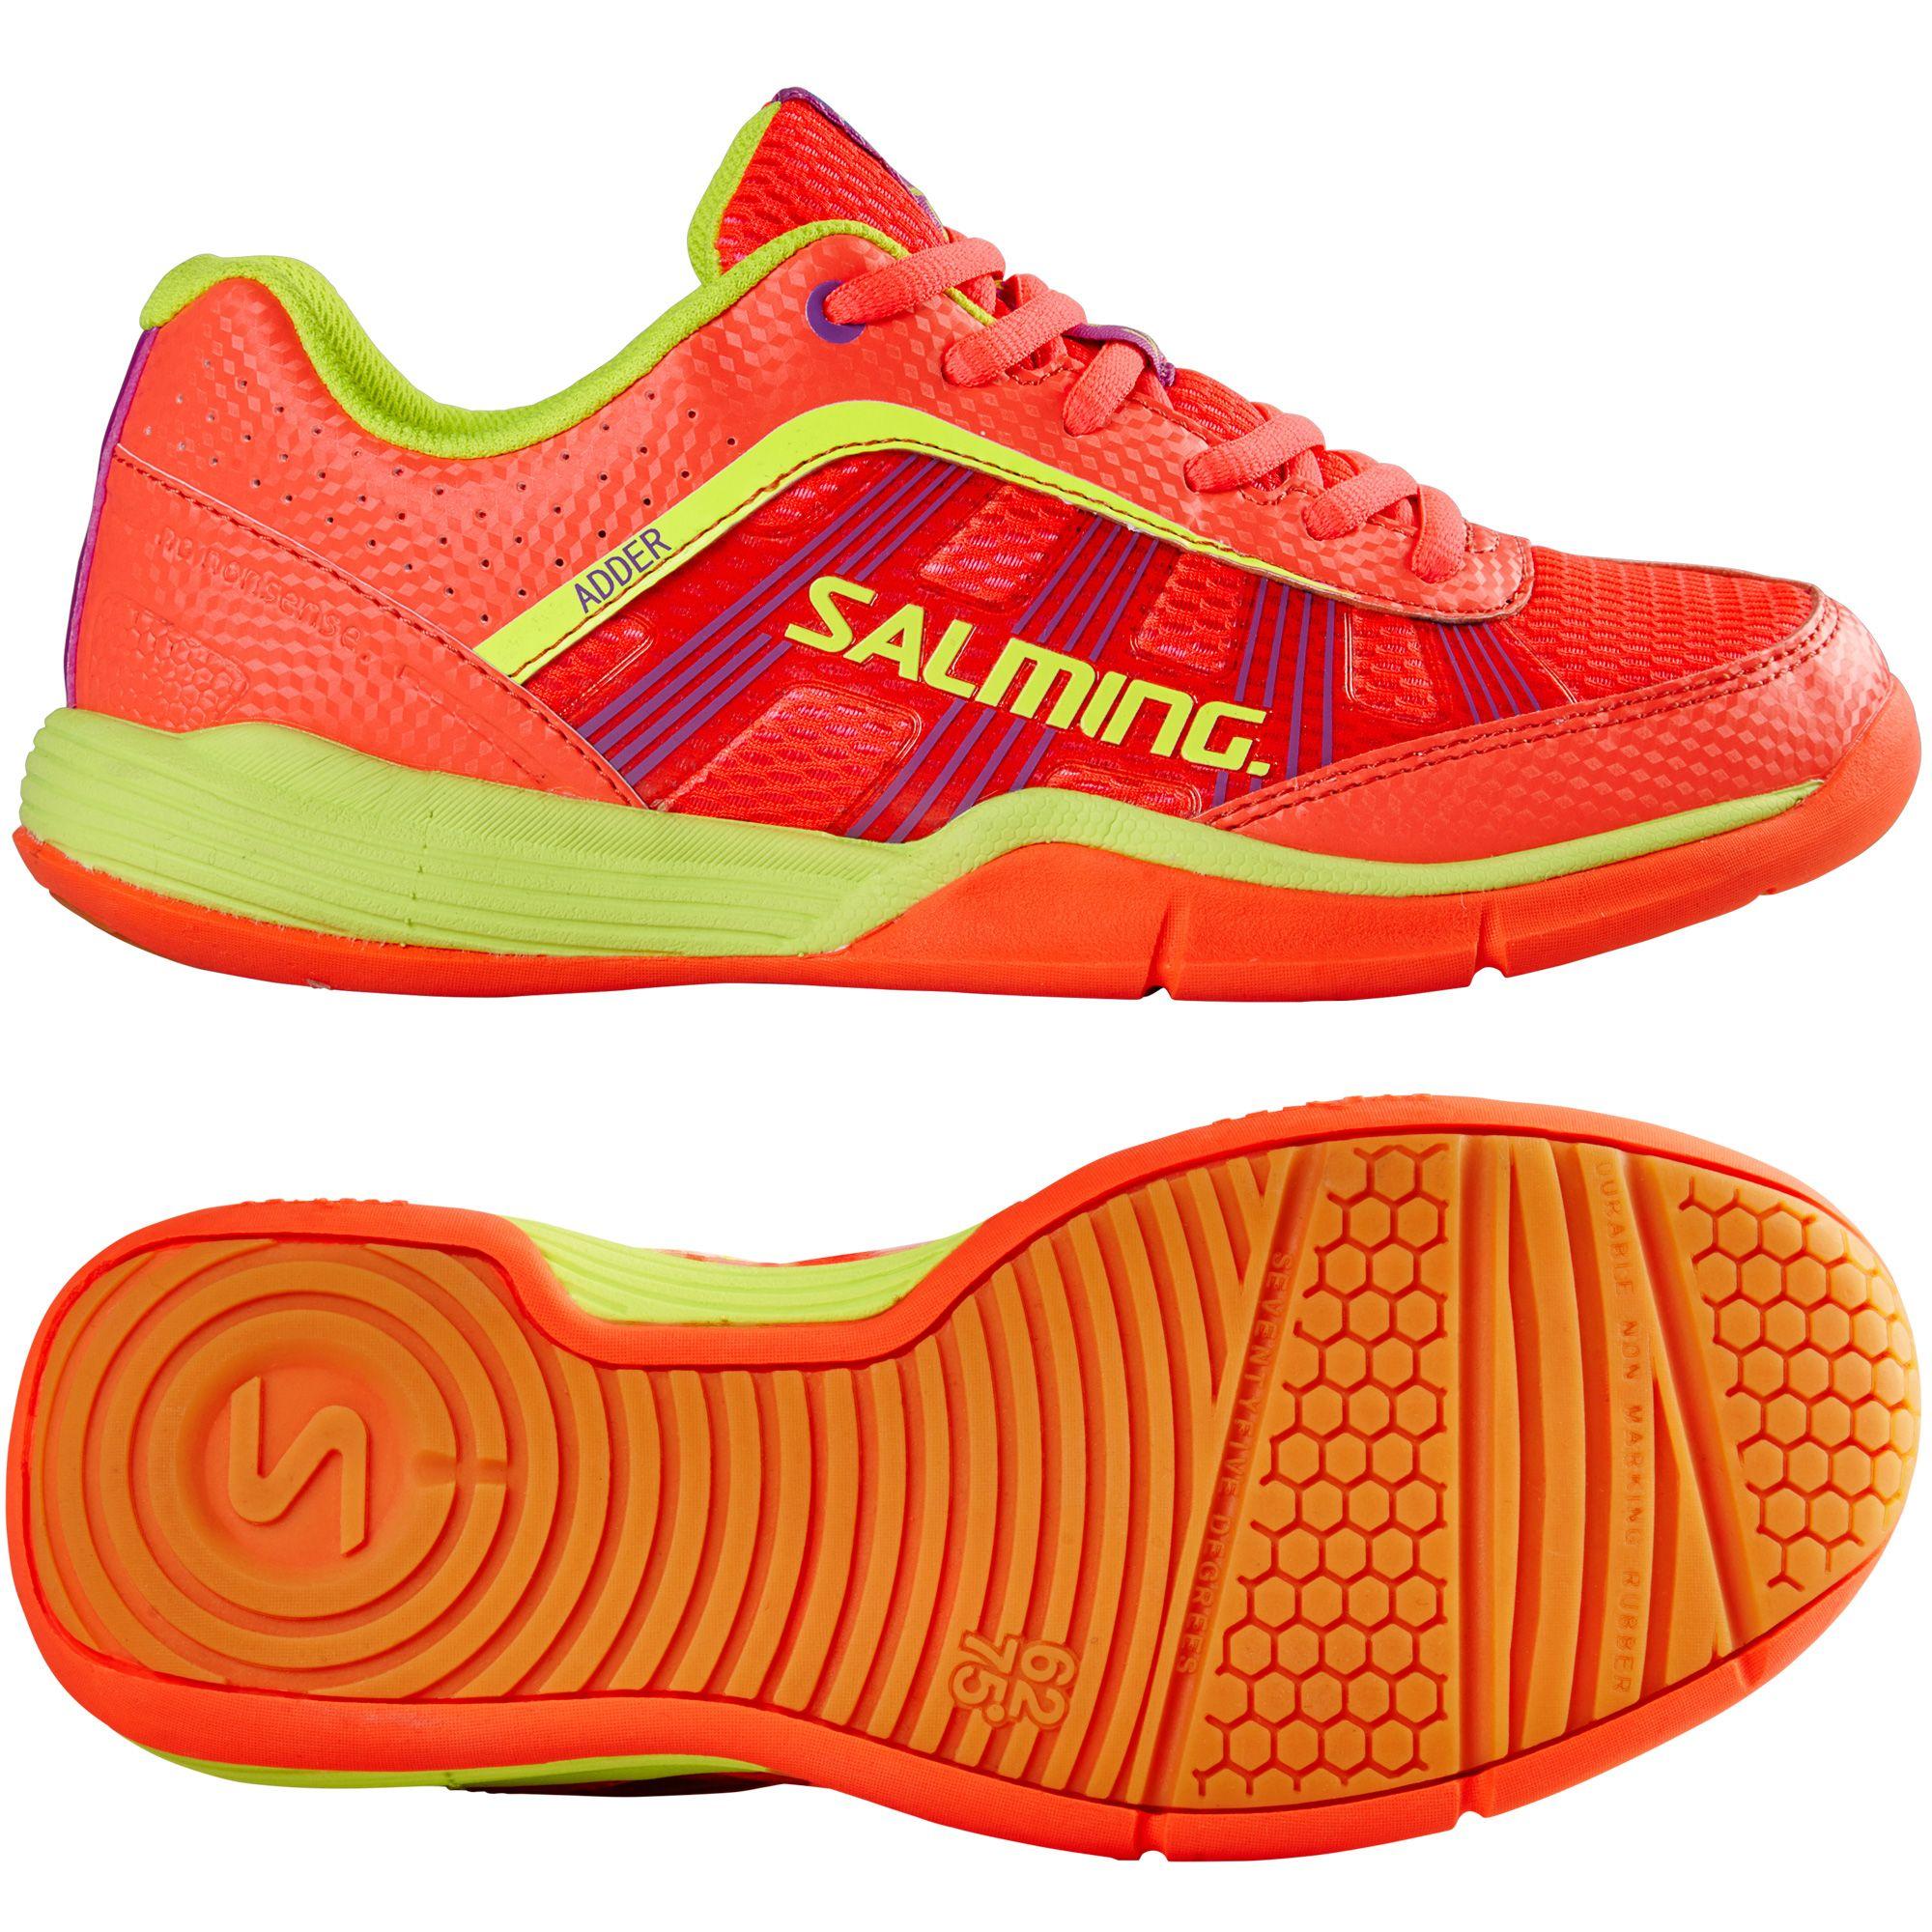 Salming Adder Ladies Court Shoes Sweatband Com